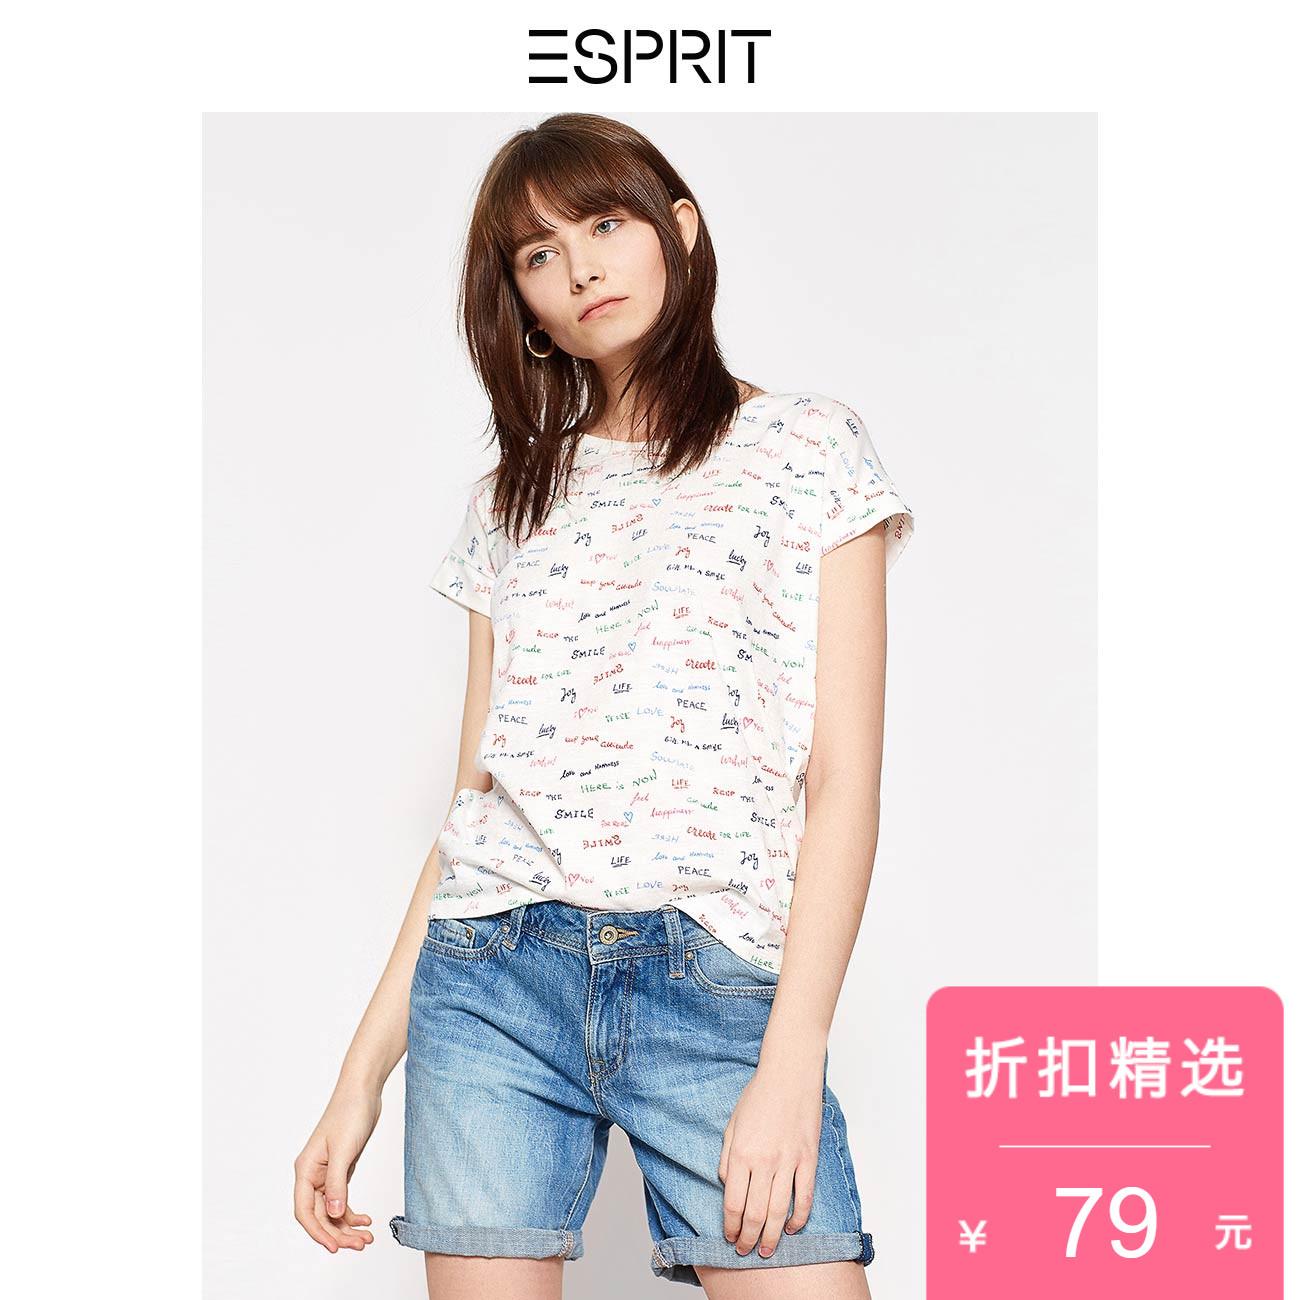 ESPRIT 女装夏装纯棉彩绘图案轻薄款连肩短袖上衣T恤-998EE1K808